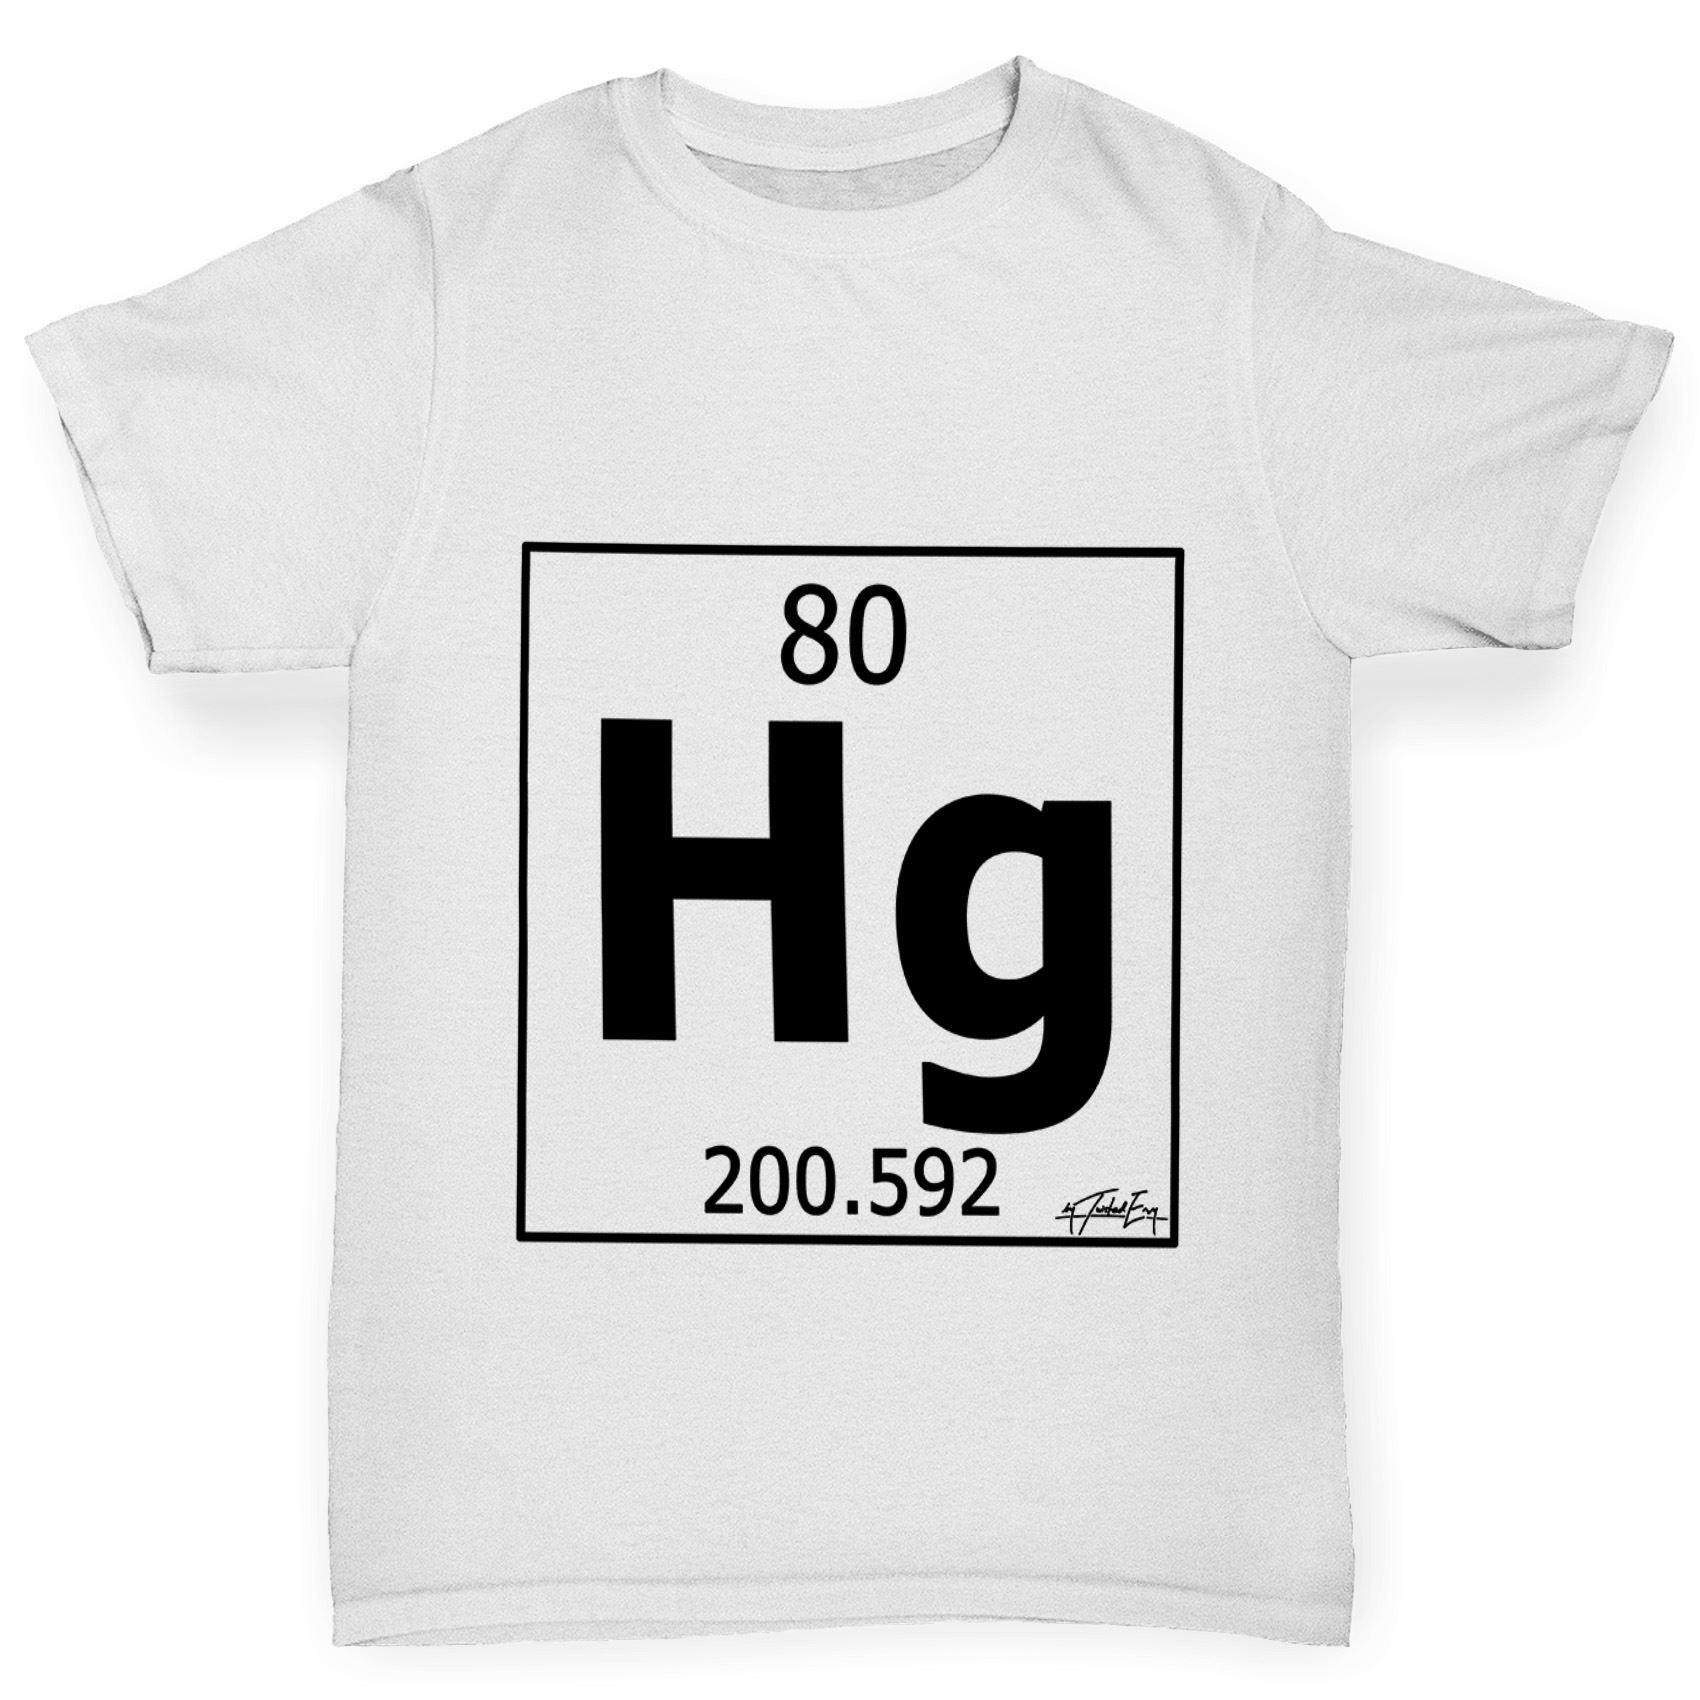 Twisted envy boys periodic table element hg mercury t shirt ebay twisted envy boy 039 s tabla periodica elemento urtaz Choice Image